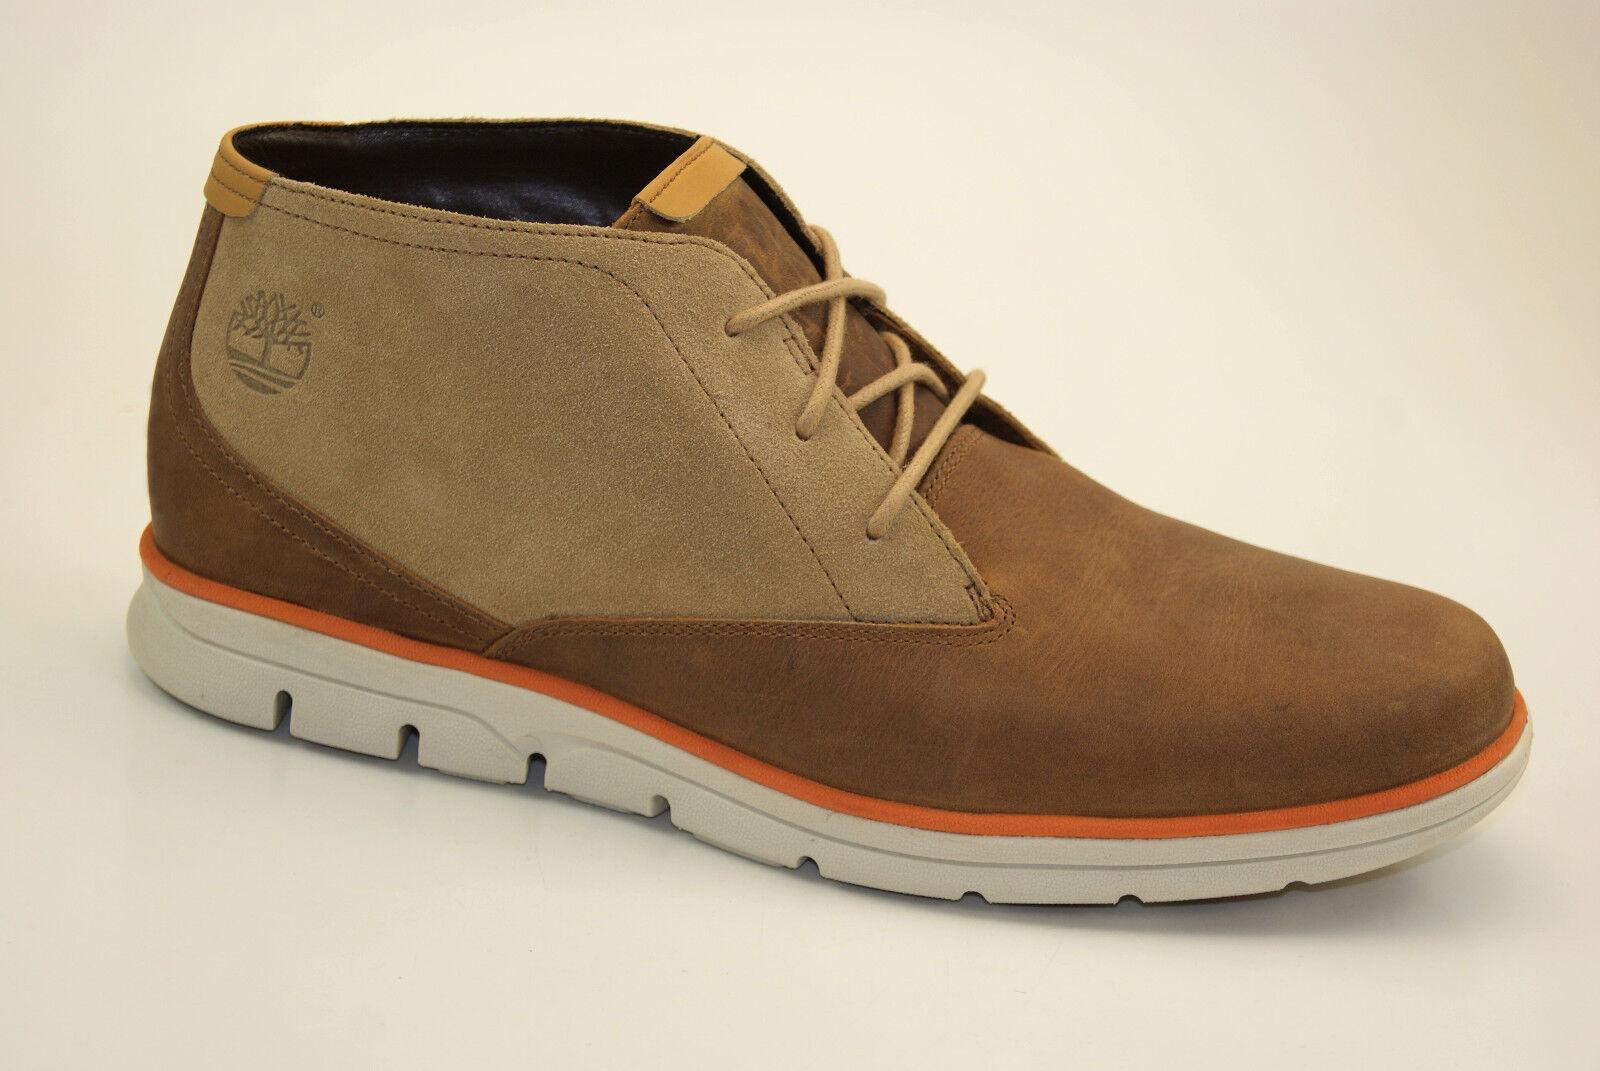 Timberland Bradstreet Chukka Boots Ultra Light Men Lace Up Shoes A15PS